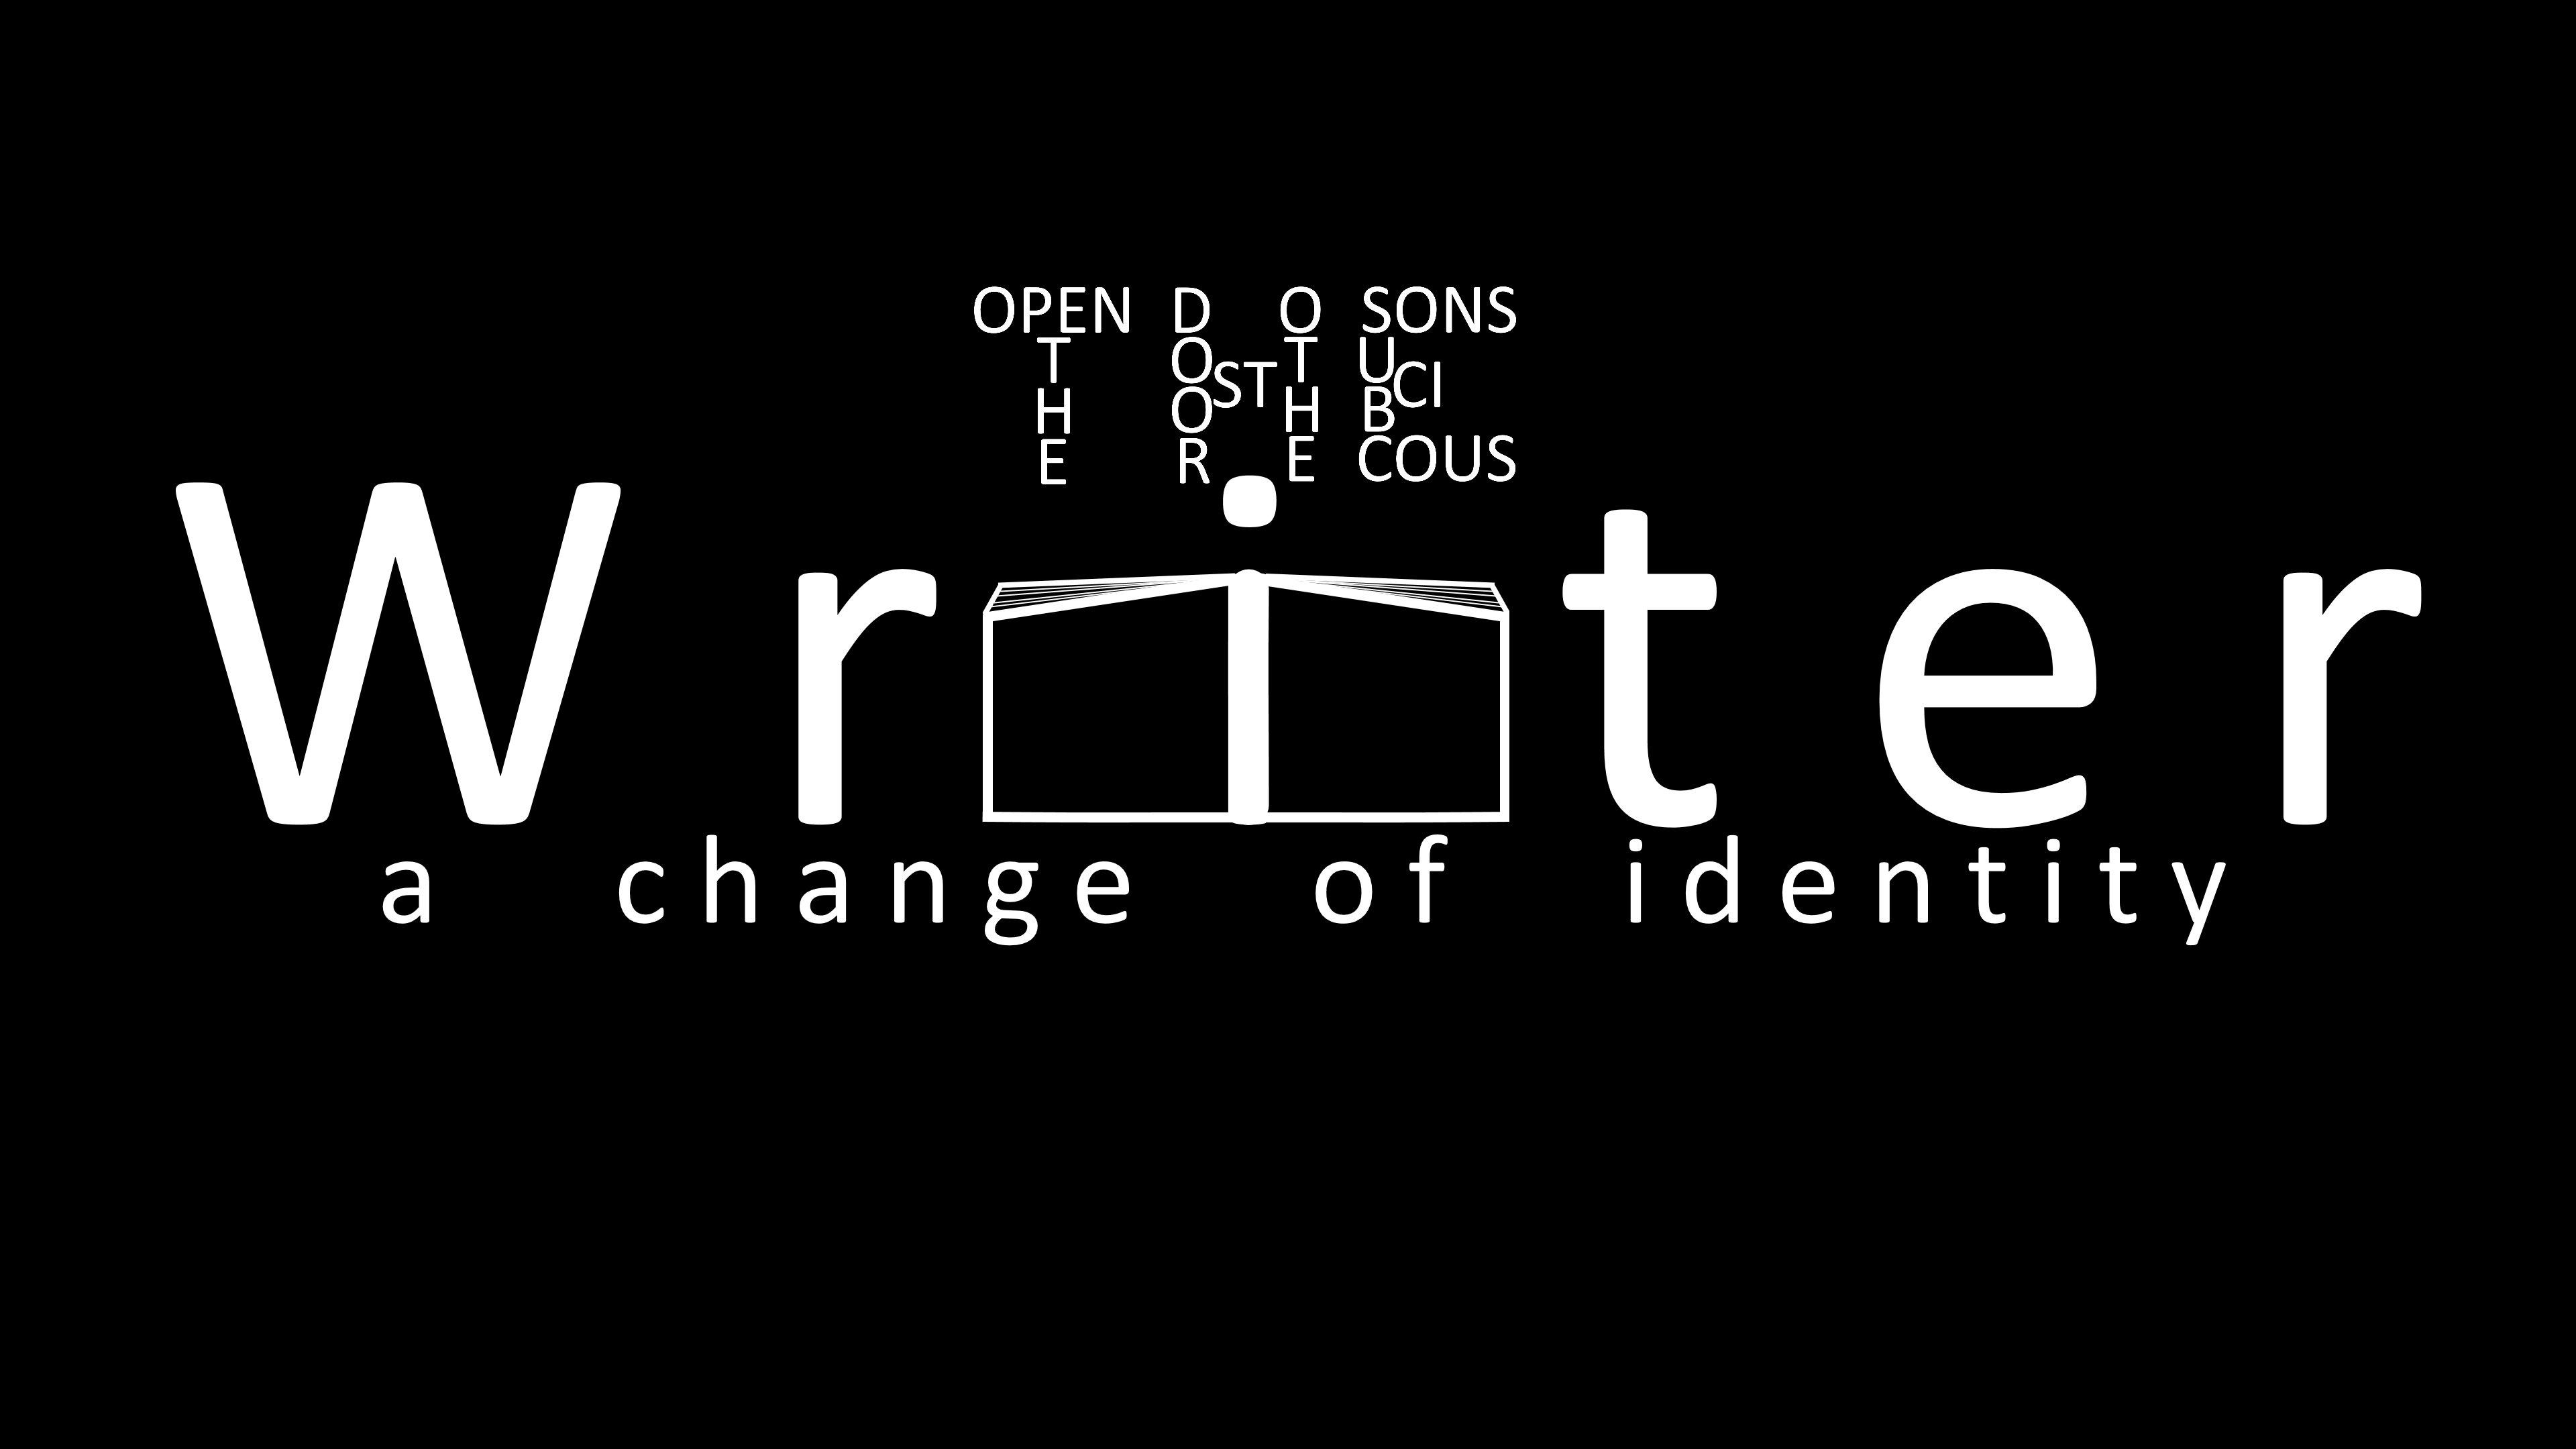 THE WRITER: СМЕНА ЛИЧНОСТИ - Изображение 1